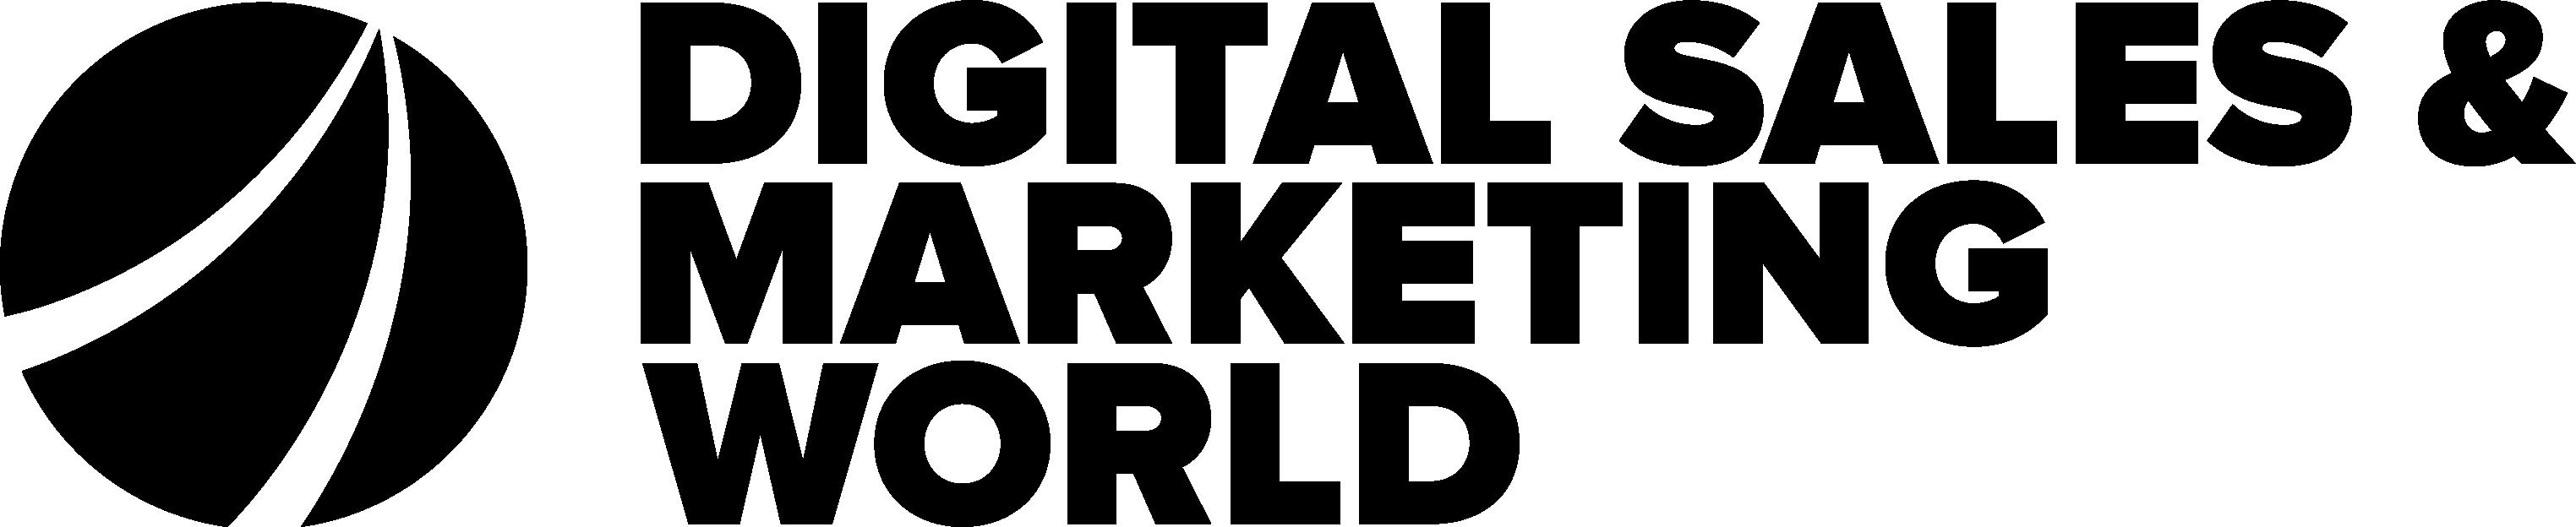 DSMW2020-Black-01